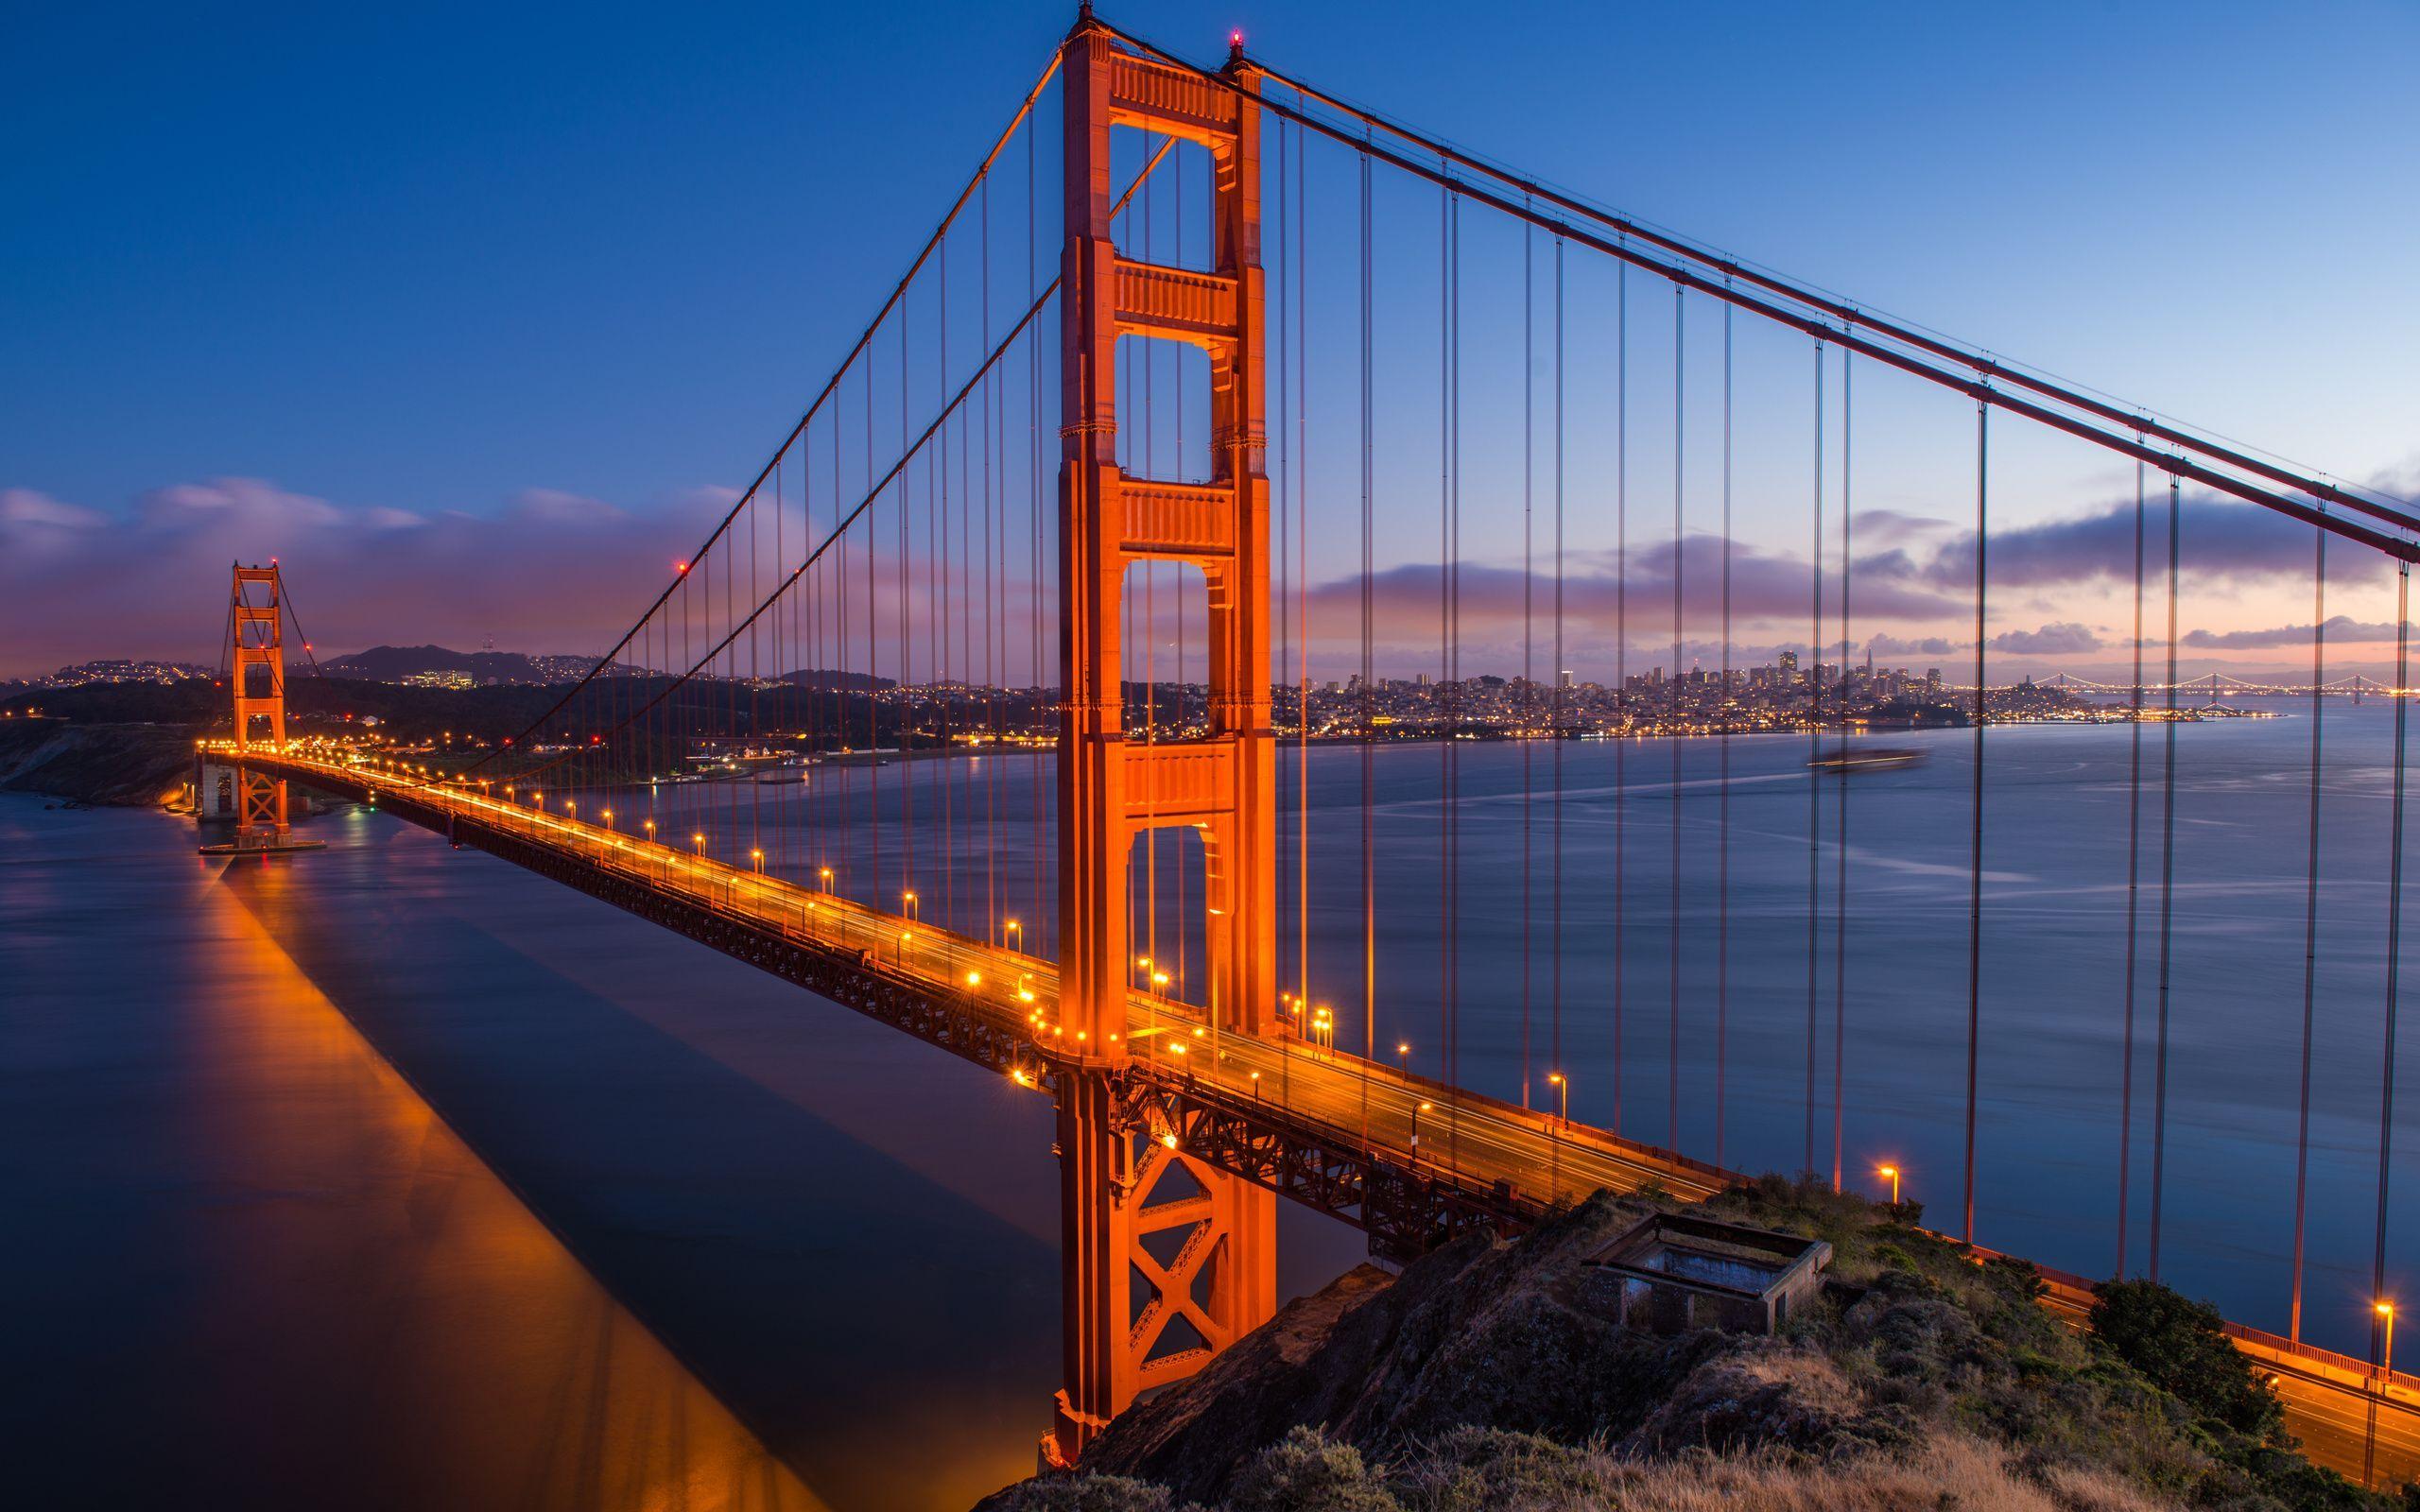 Free download Golden Gate Bridge